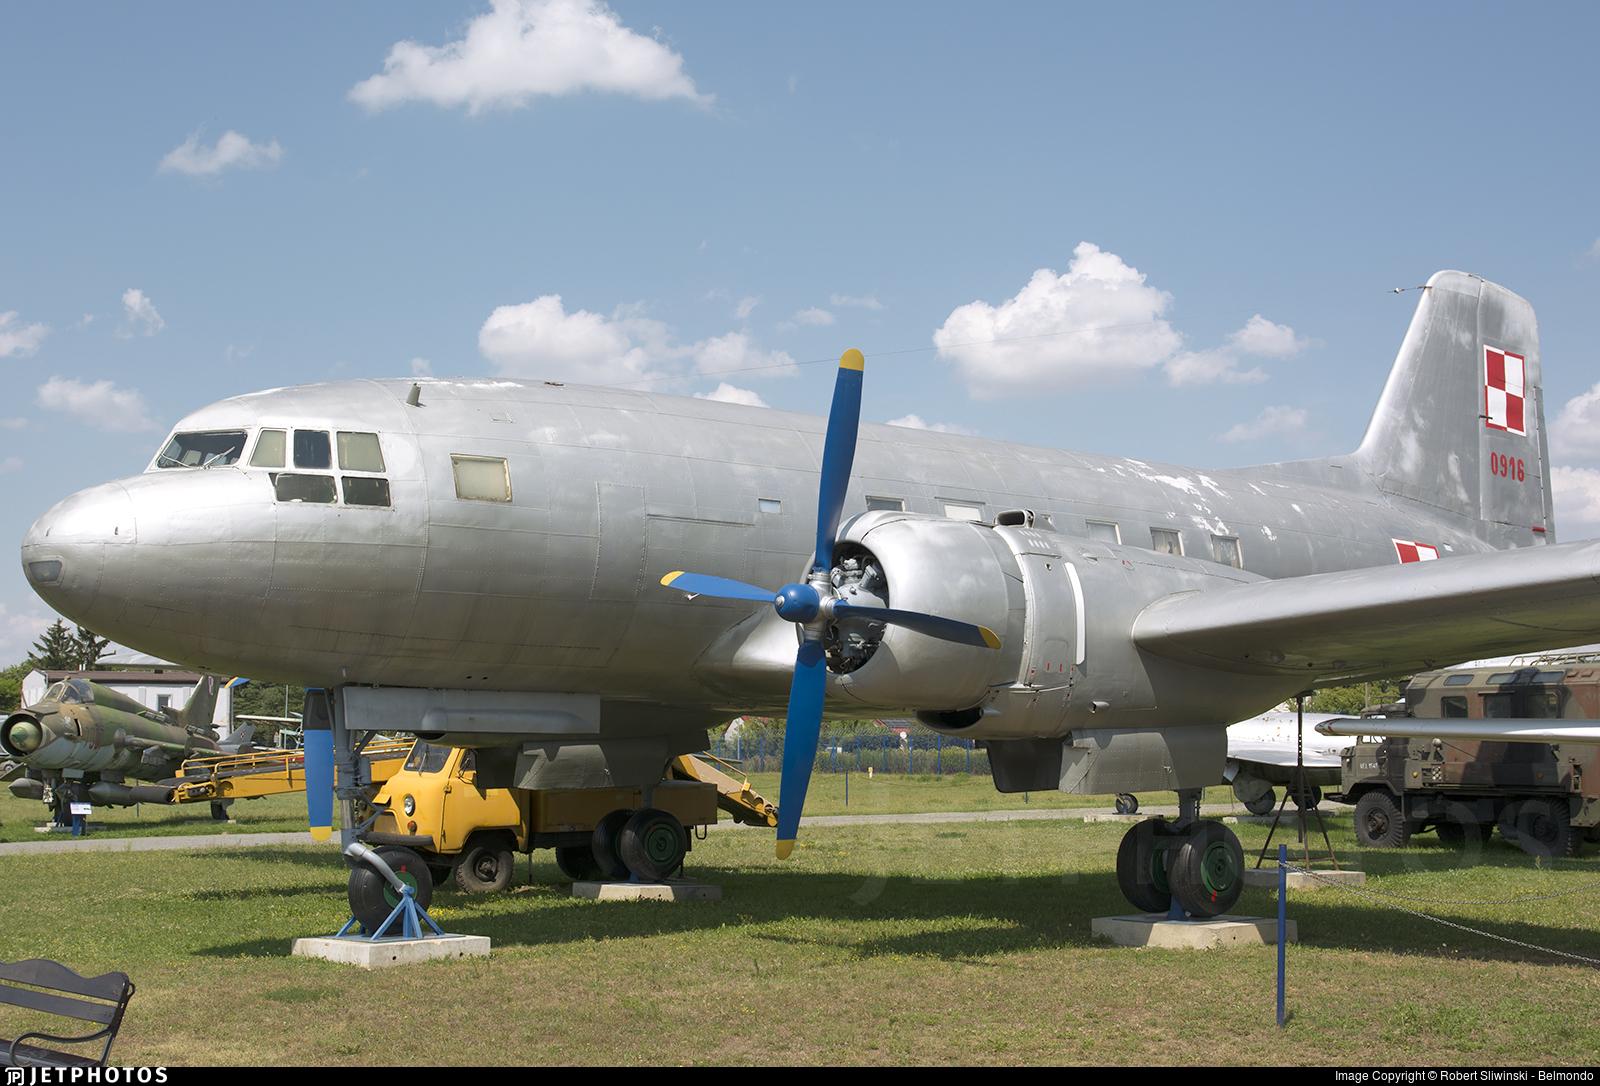 0916 - Ilyushin IL-14 - Poland - Air Force